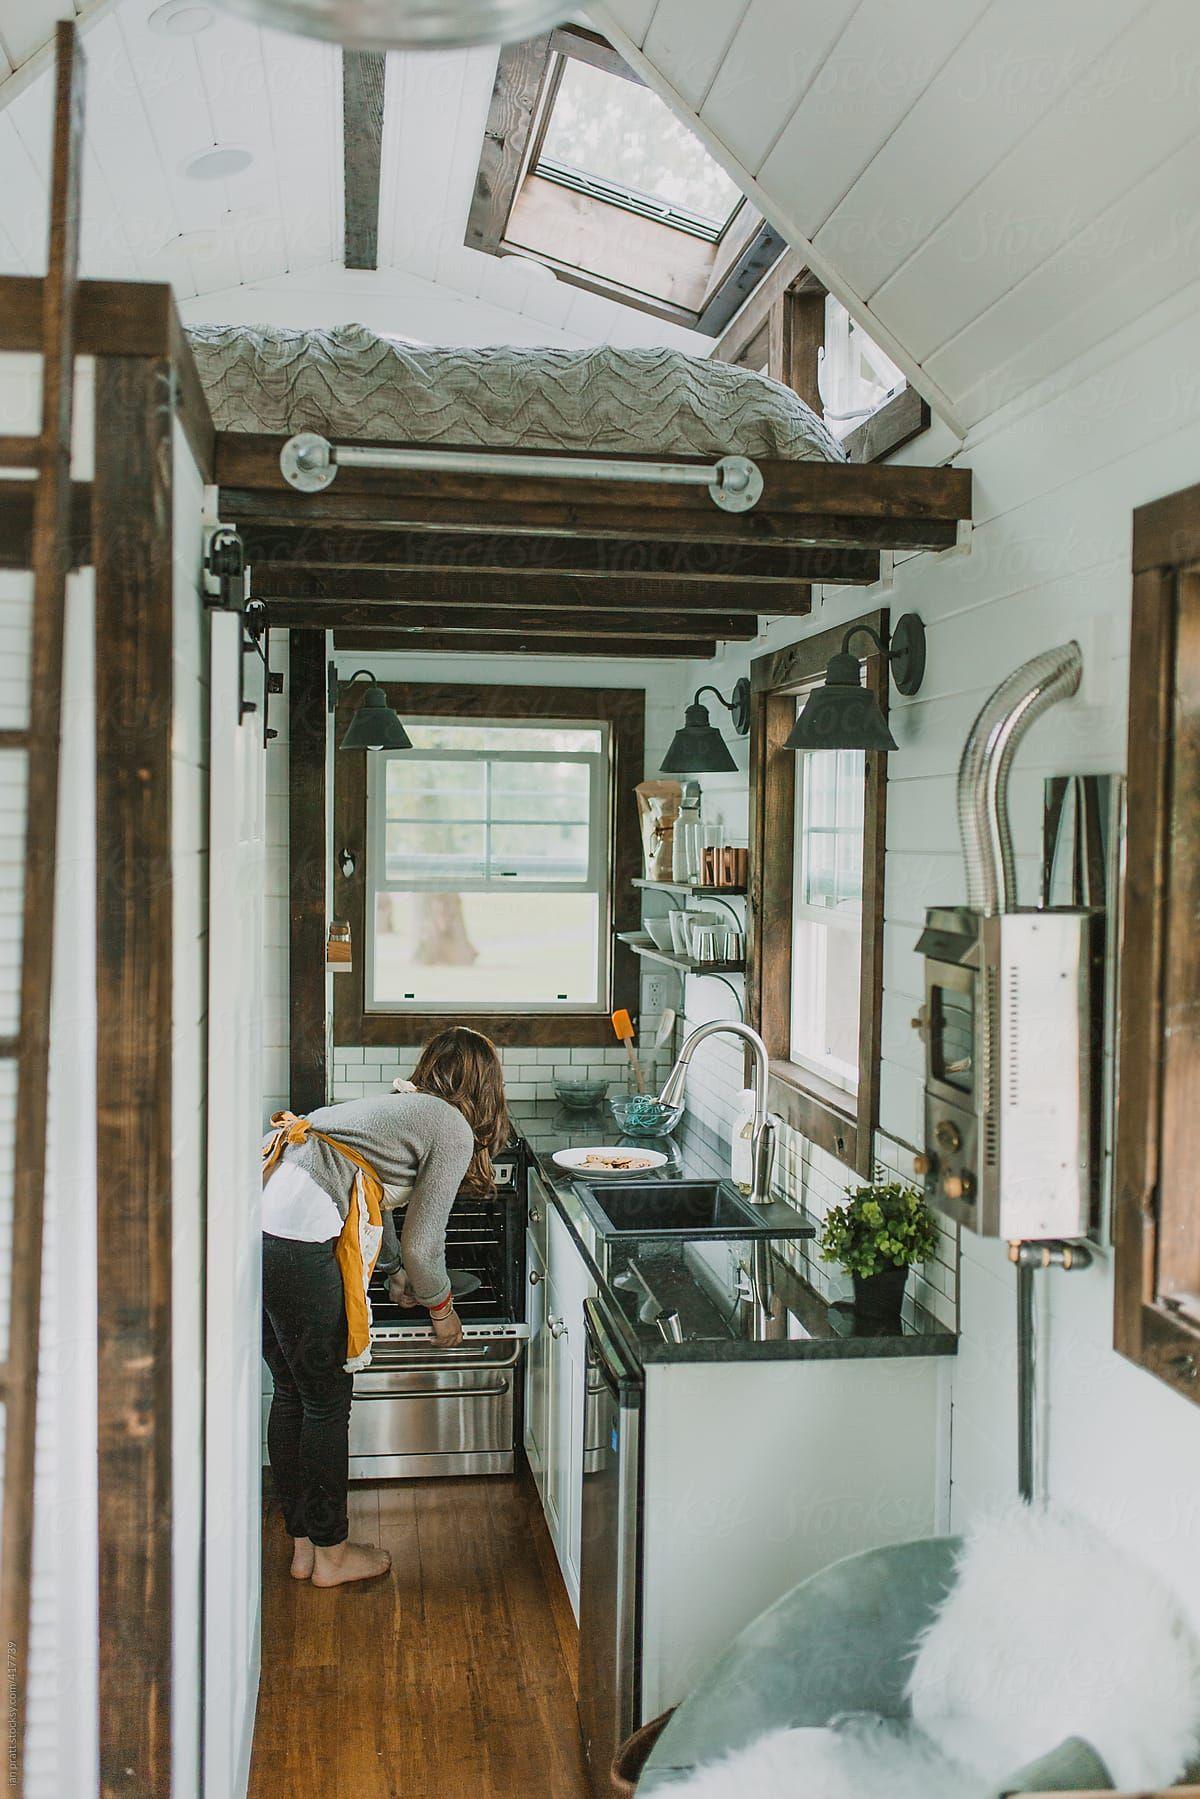 Stock photo tiny house baking in lillstugan pinterest